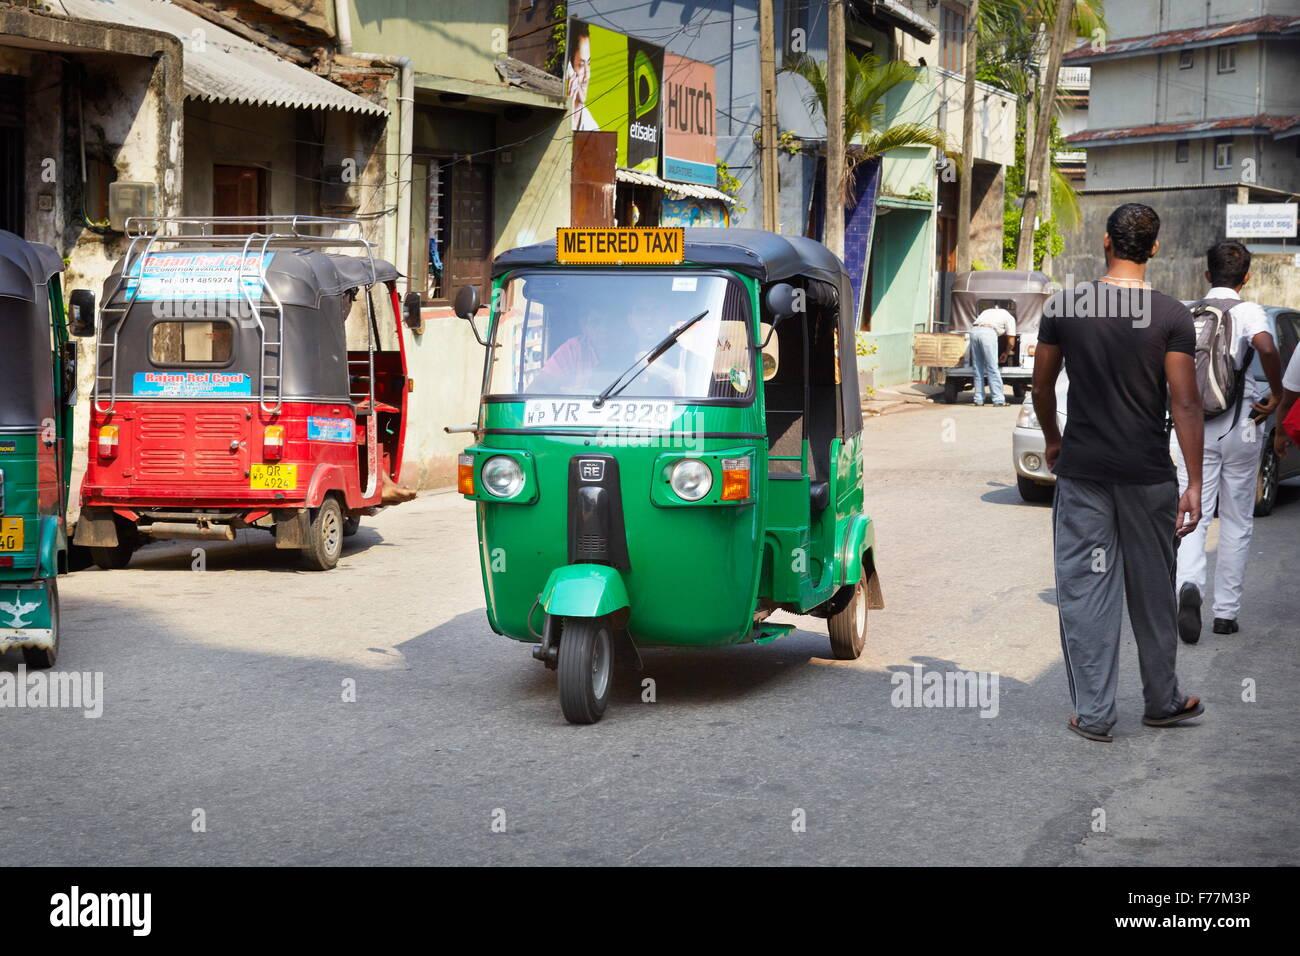 Sri Lanka - Colombo, un tuk tuk taxi, Trasporti tipici Immagini Stock